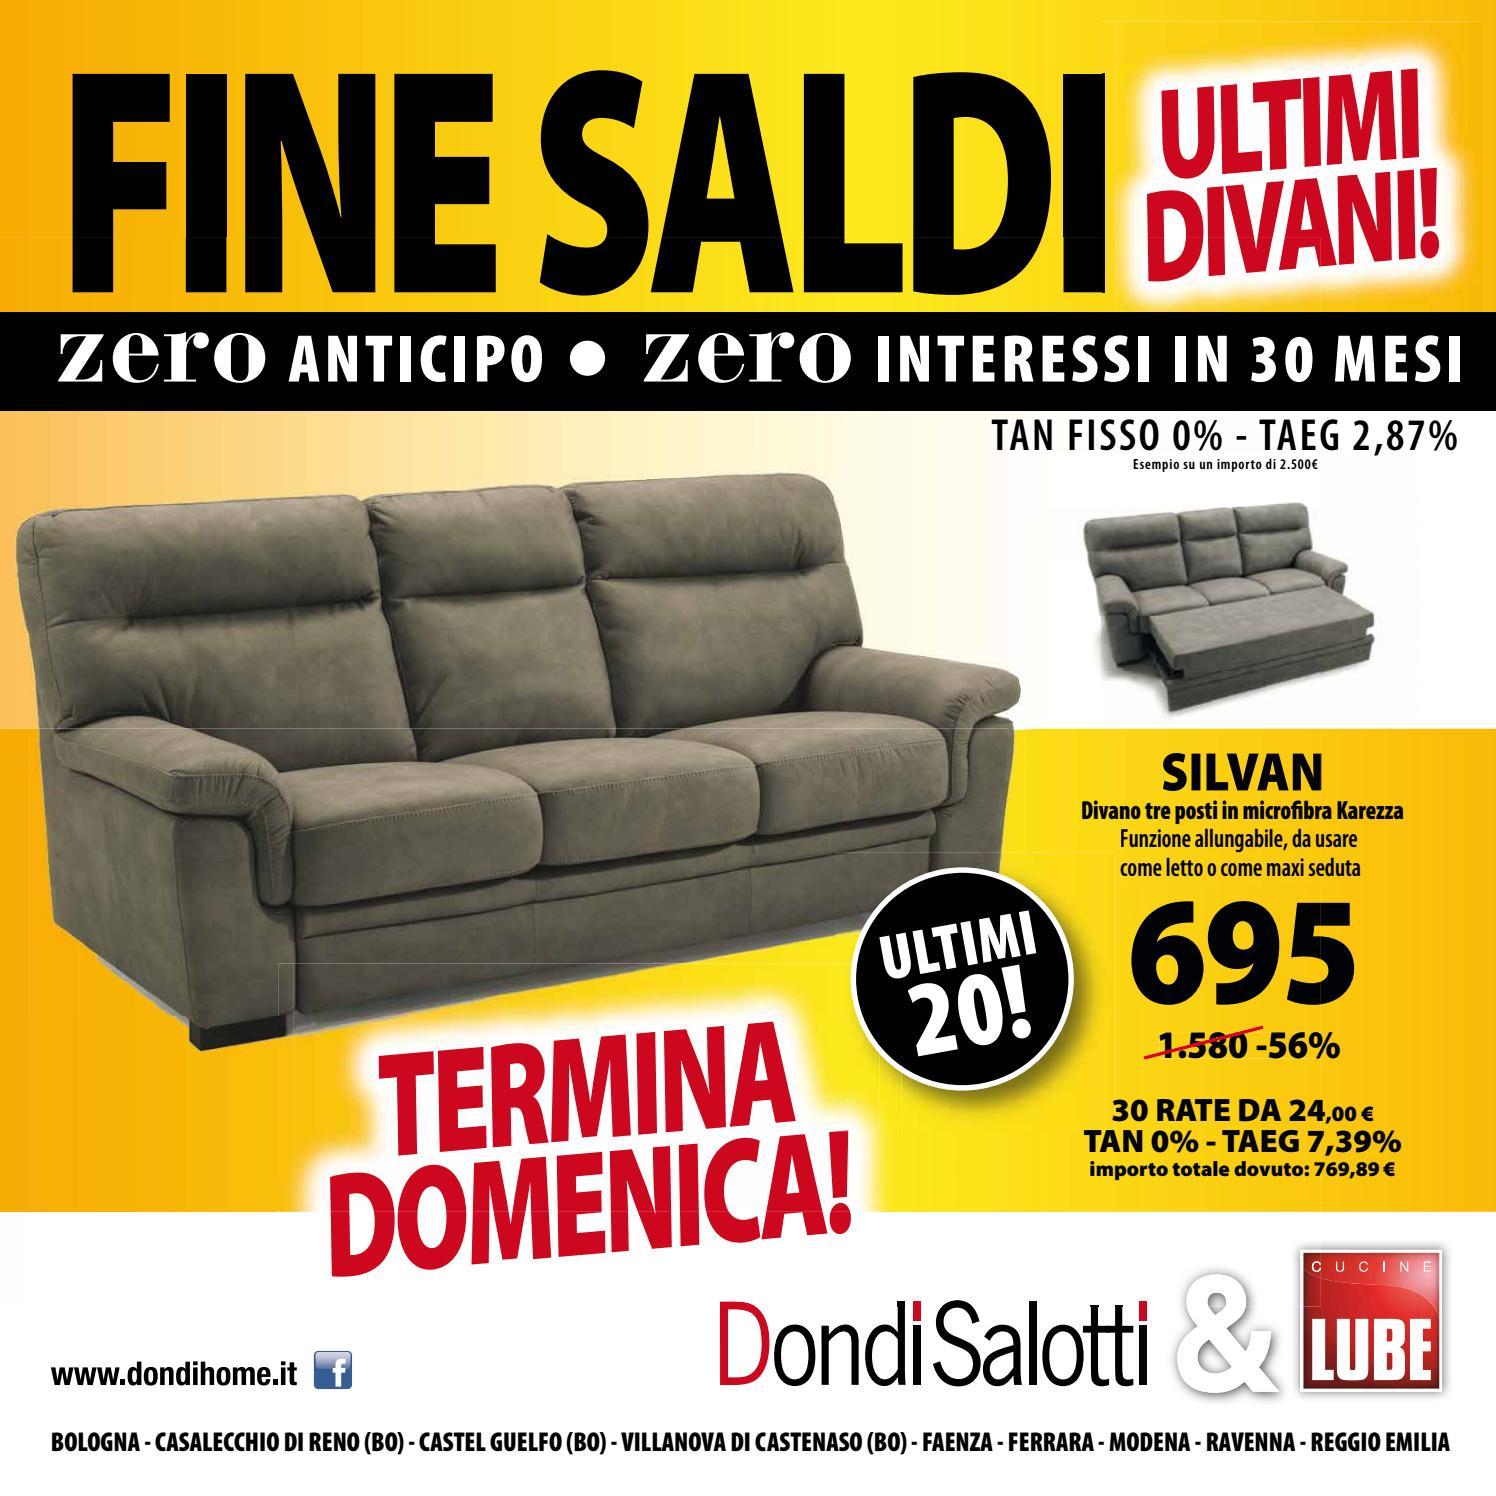 Dondi Salotti fine saldi by Michele Travagli - issuu